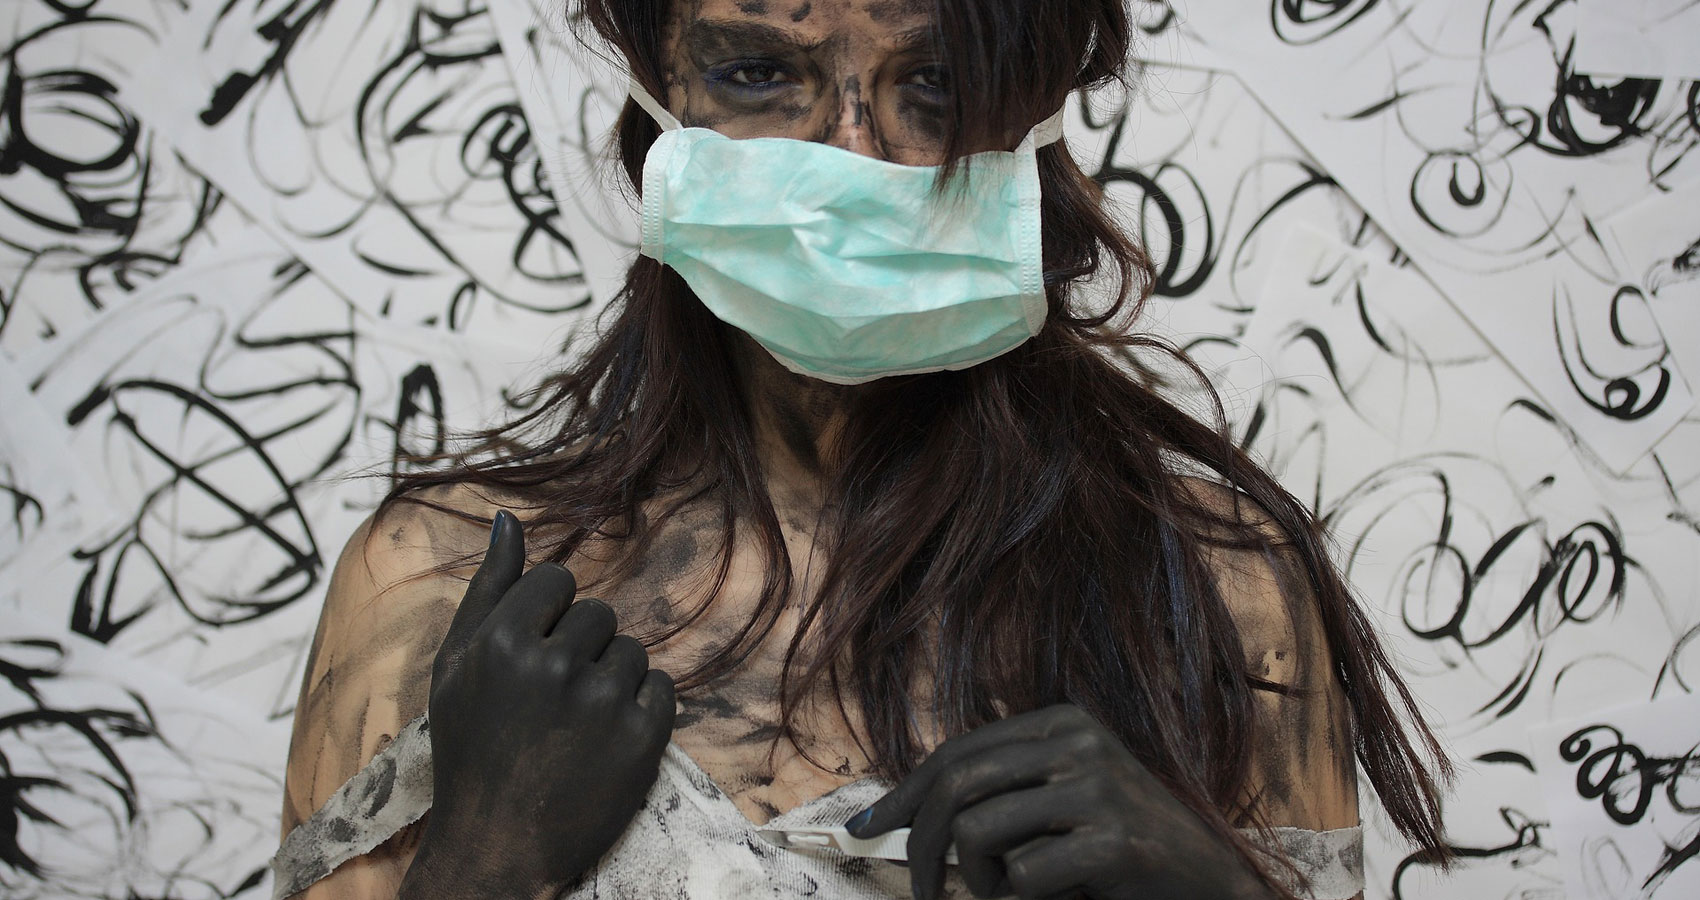 I Am Falling Into Insanity by Khalid Belkhalfiat Spillwords.com